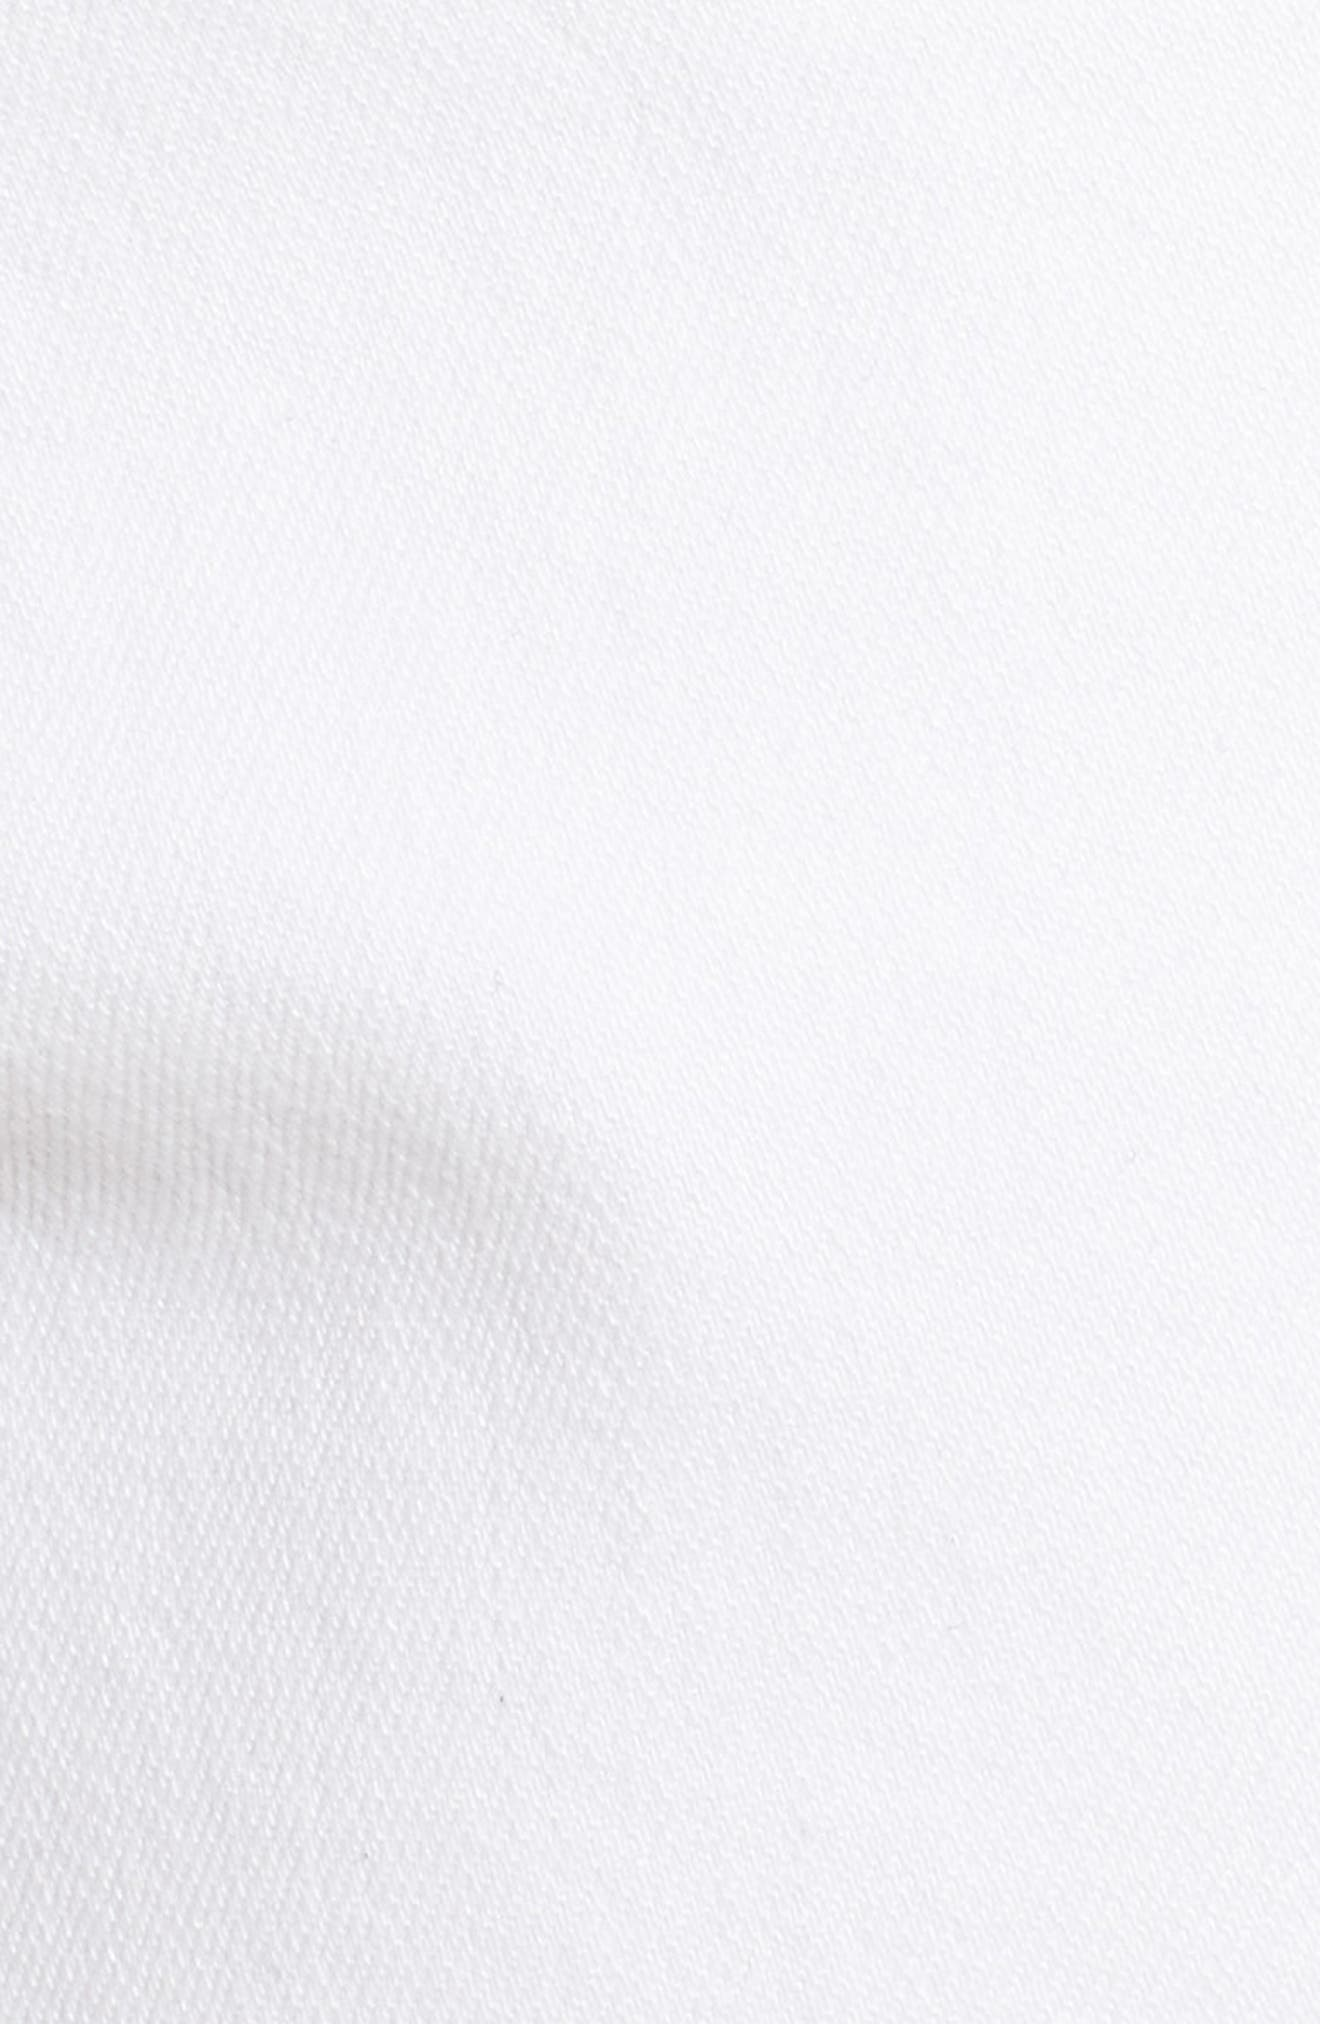 Karlie Cutoff Denim Boyfriend Shorts,                             Alternate thumbnail 5, color,                             100